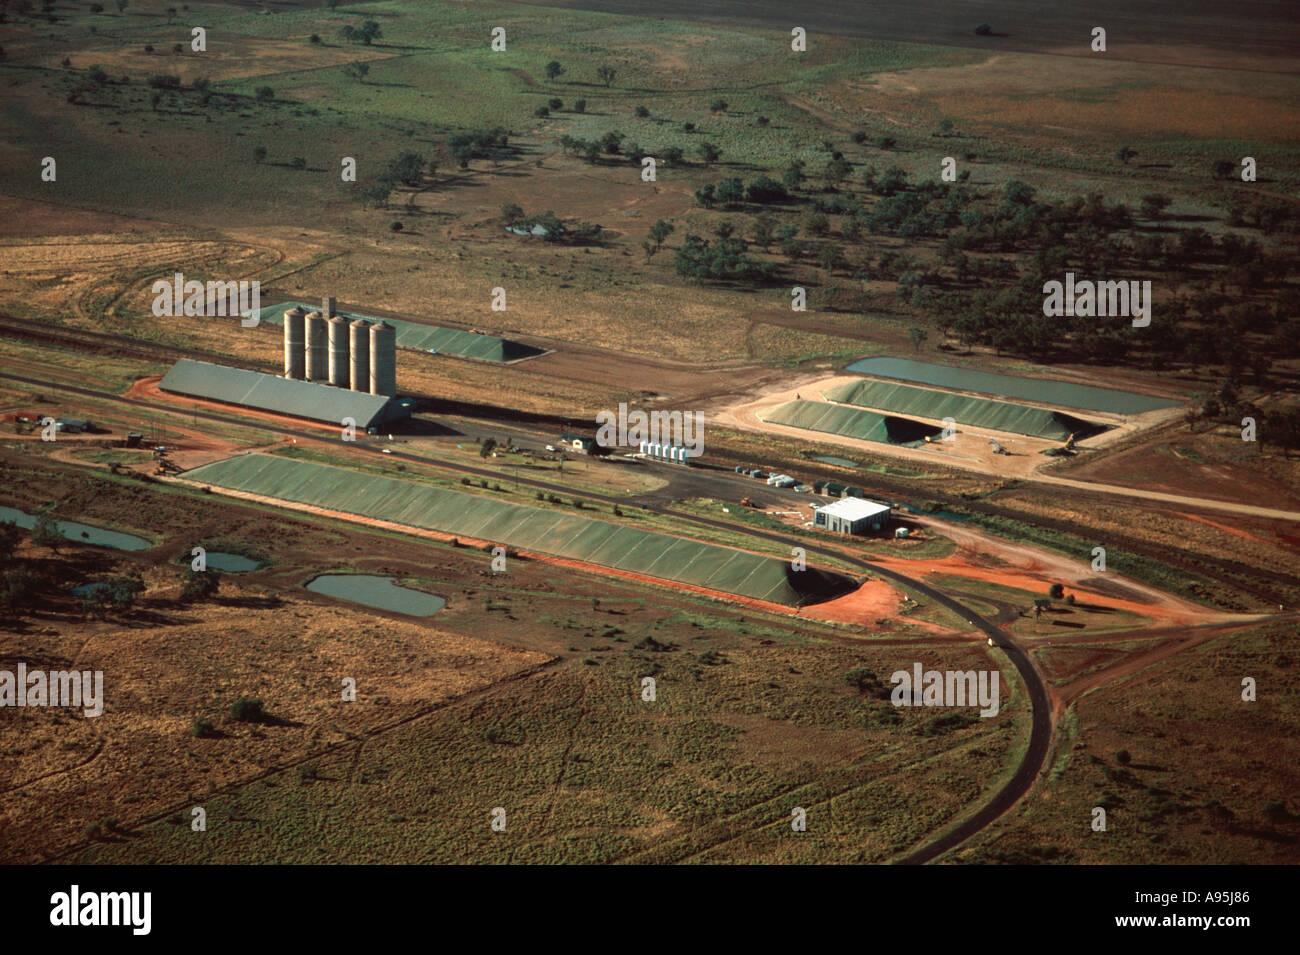 grain storage - Stock Image